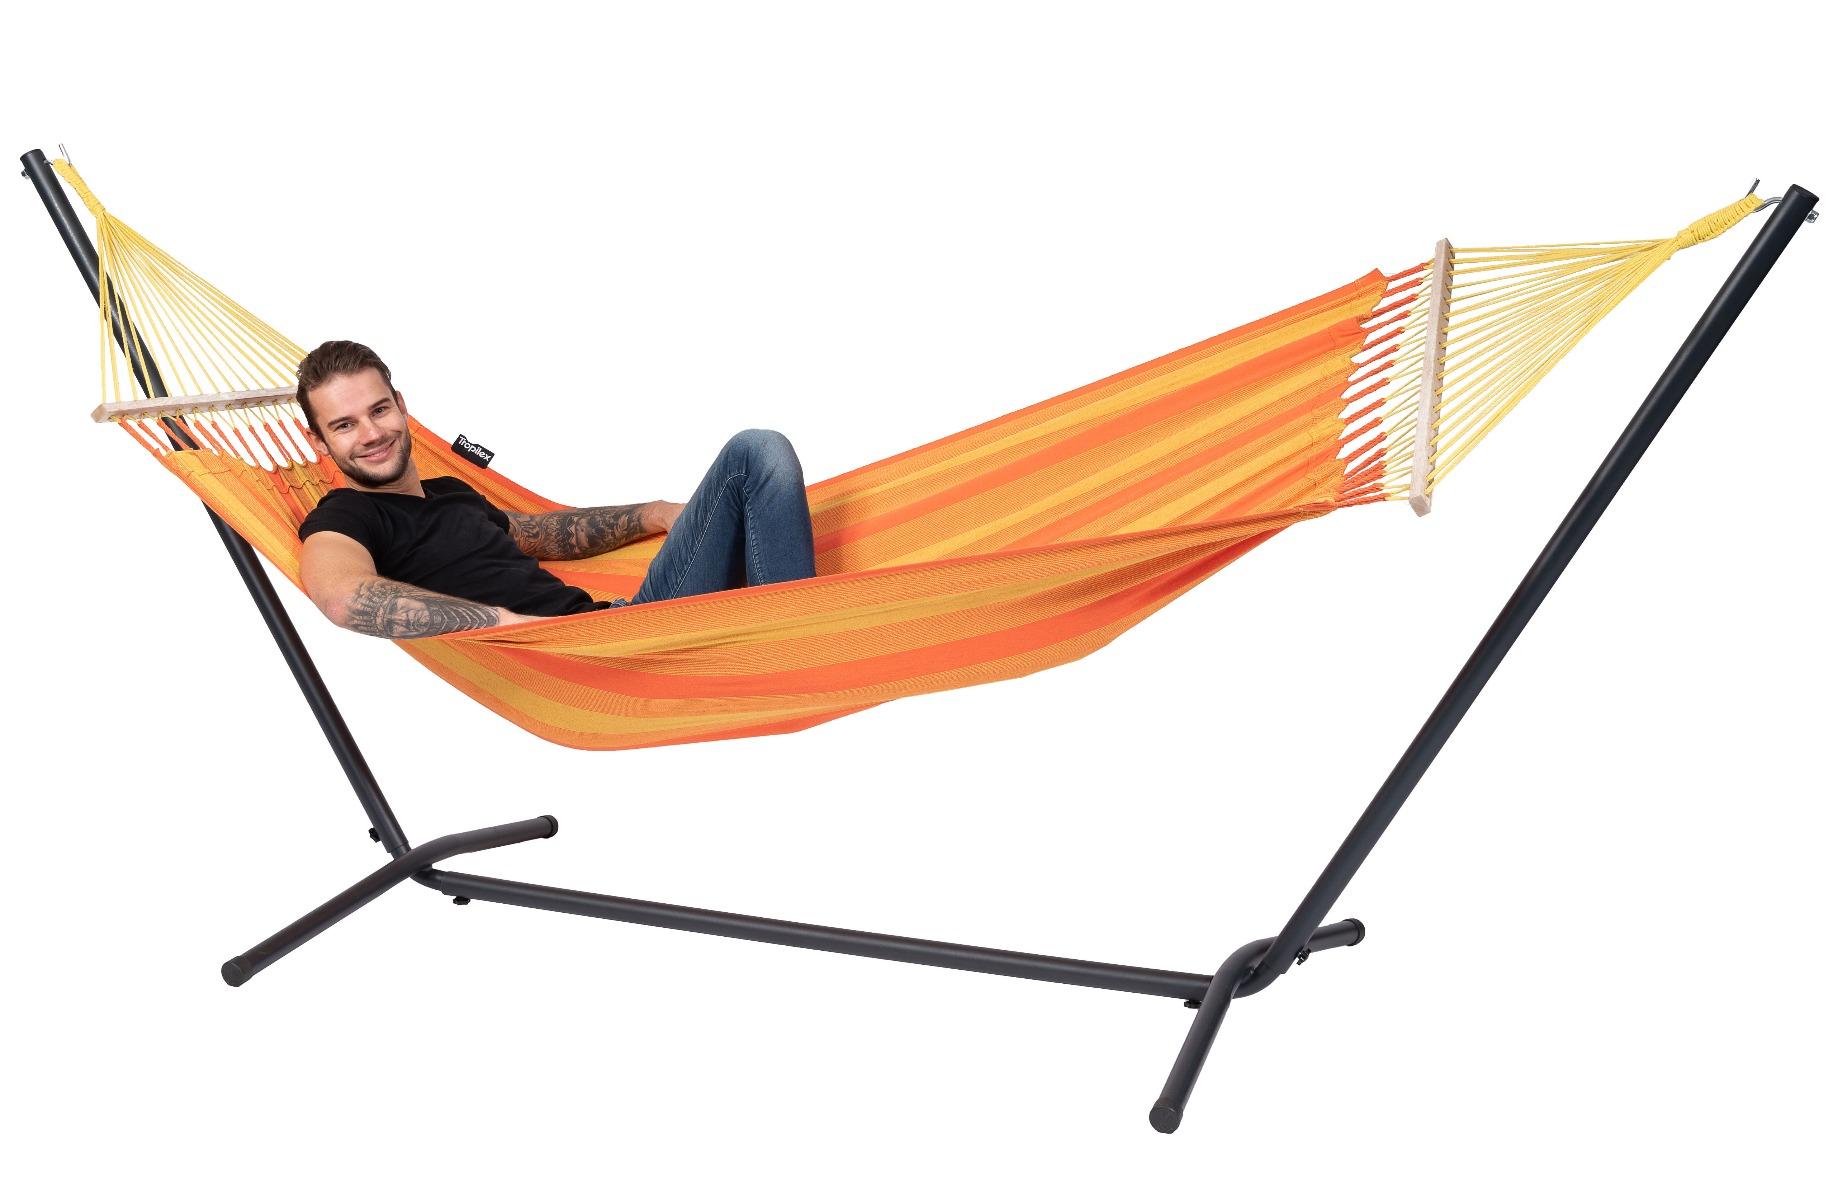 Hangmat met Standaard Eénpersoons 'Easy & Relax' Orange